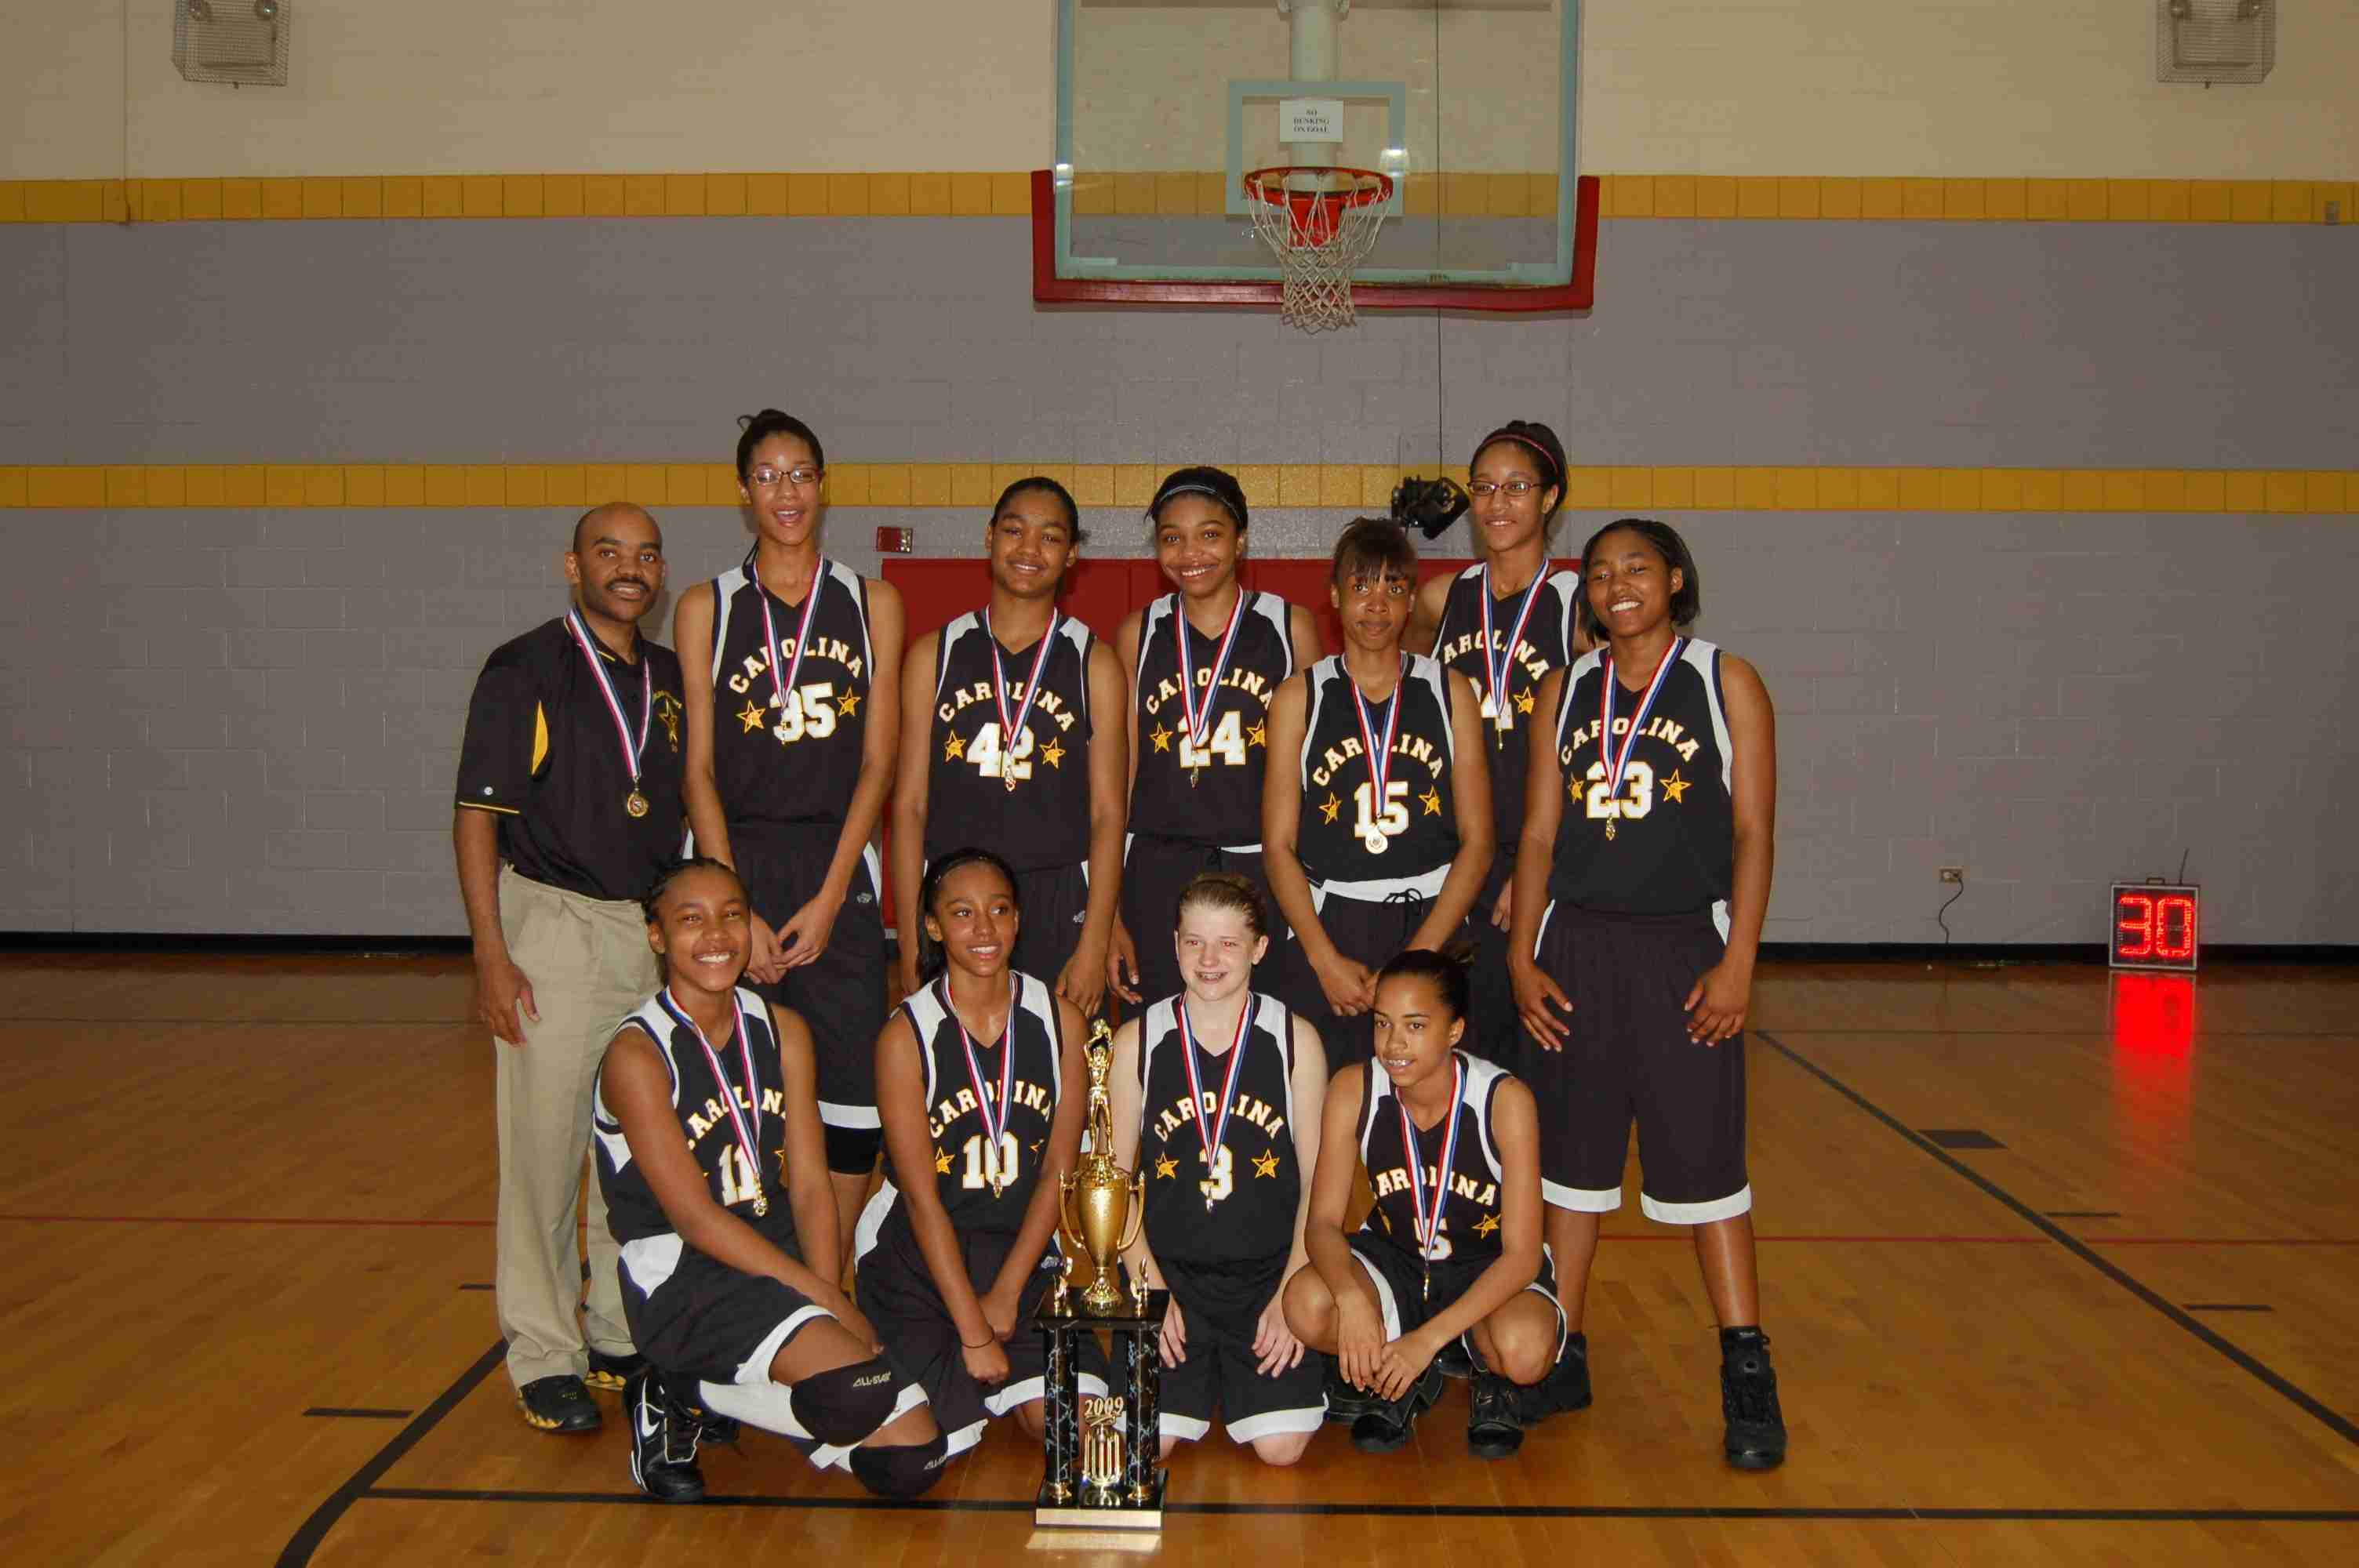 Carolina All-Stars 13U State Champions